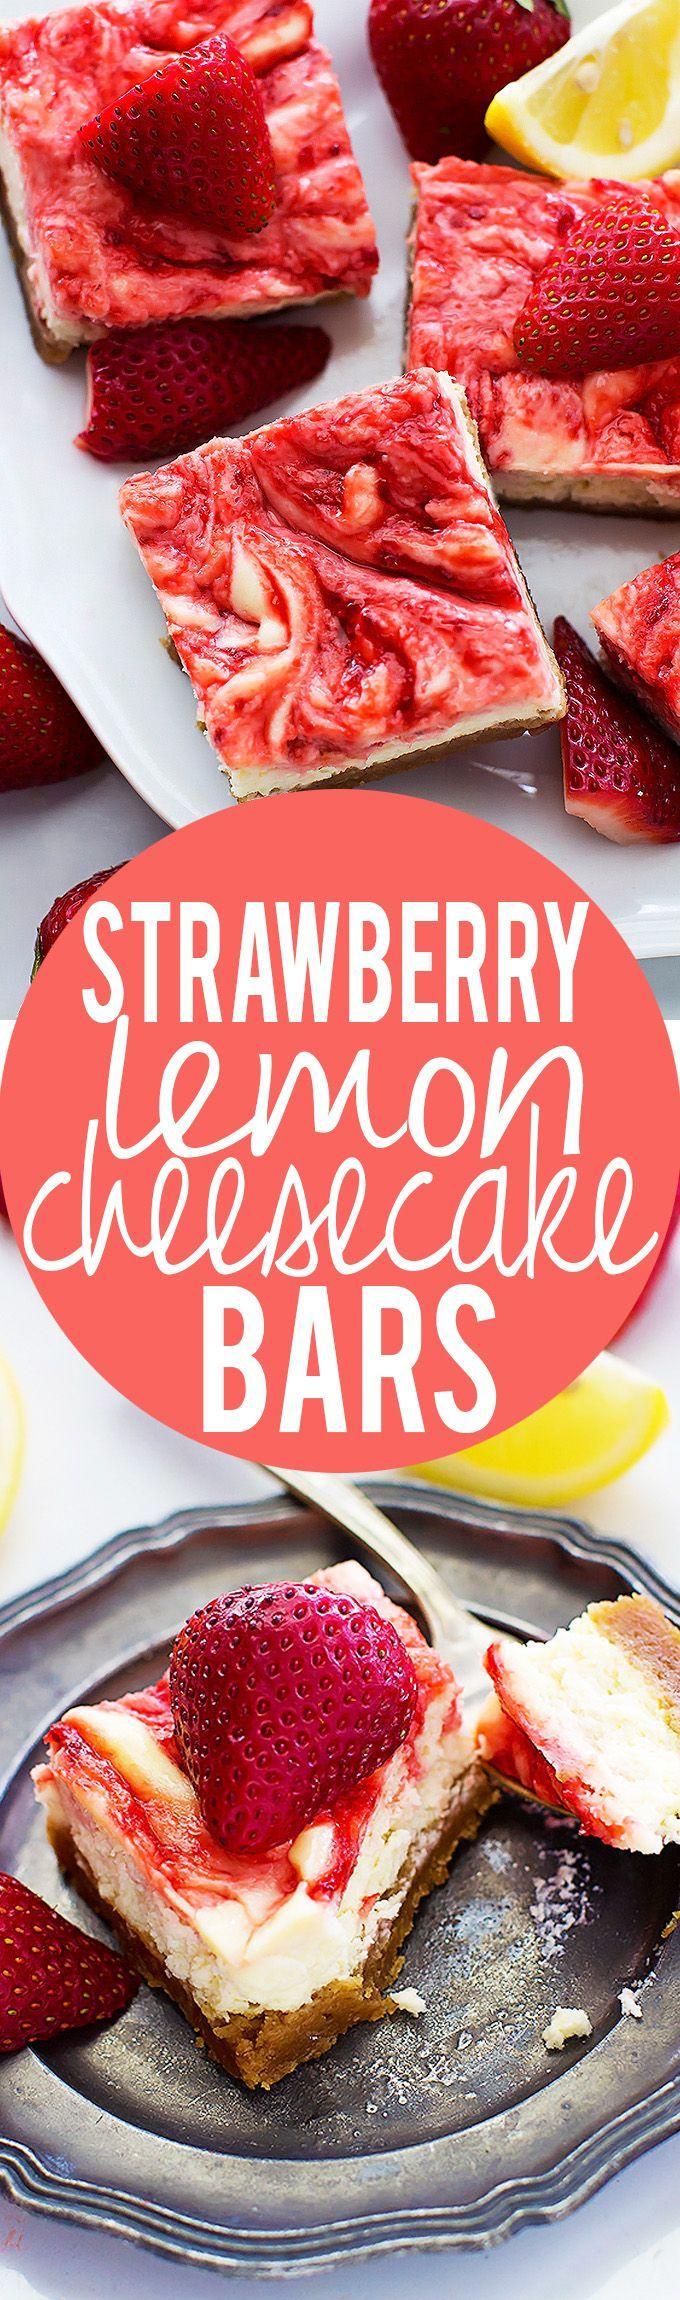 strawberry lemon cheesecake bars vegan lemon bars delicious desserts ...